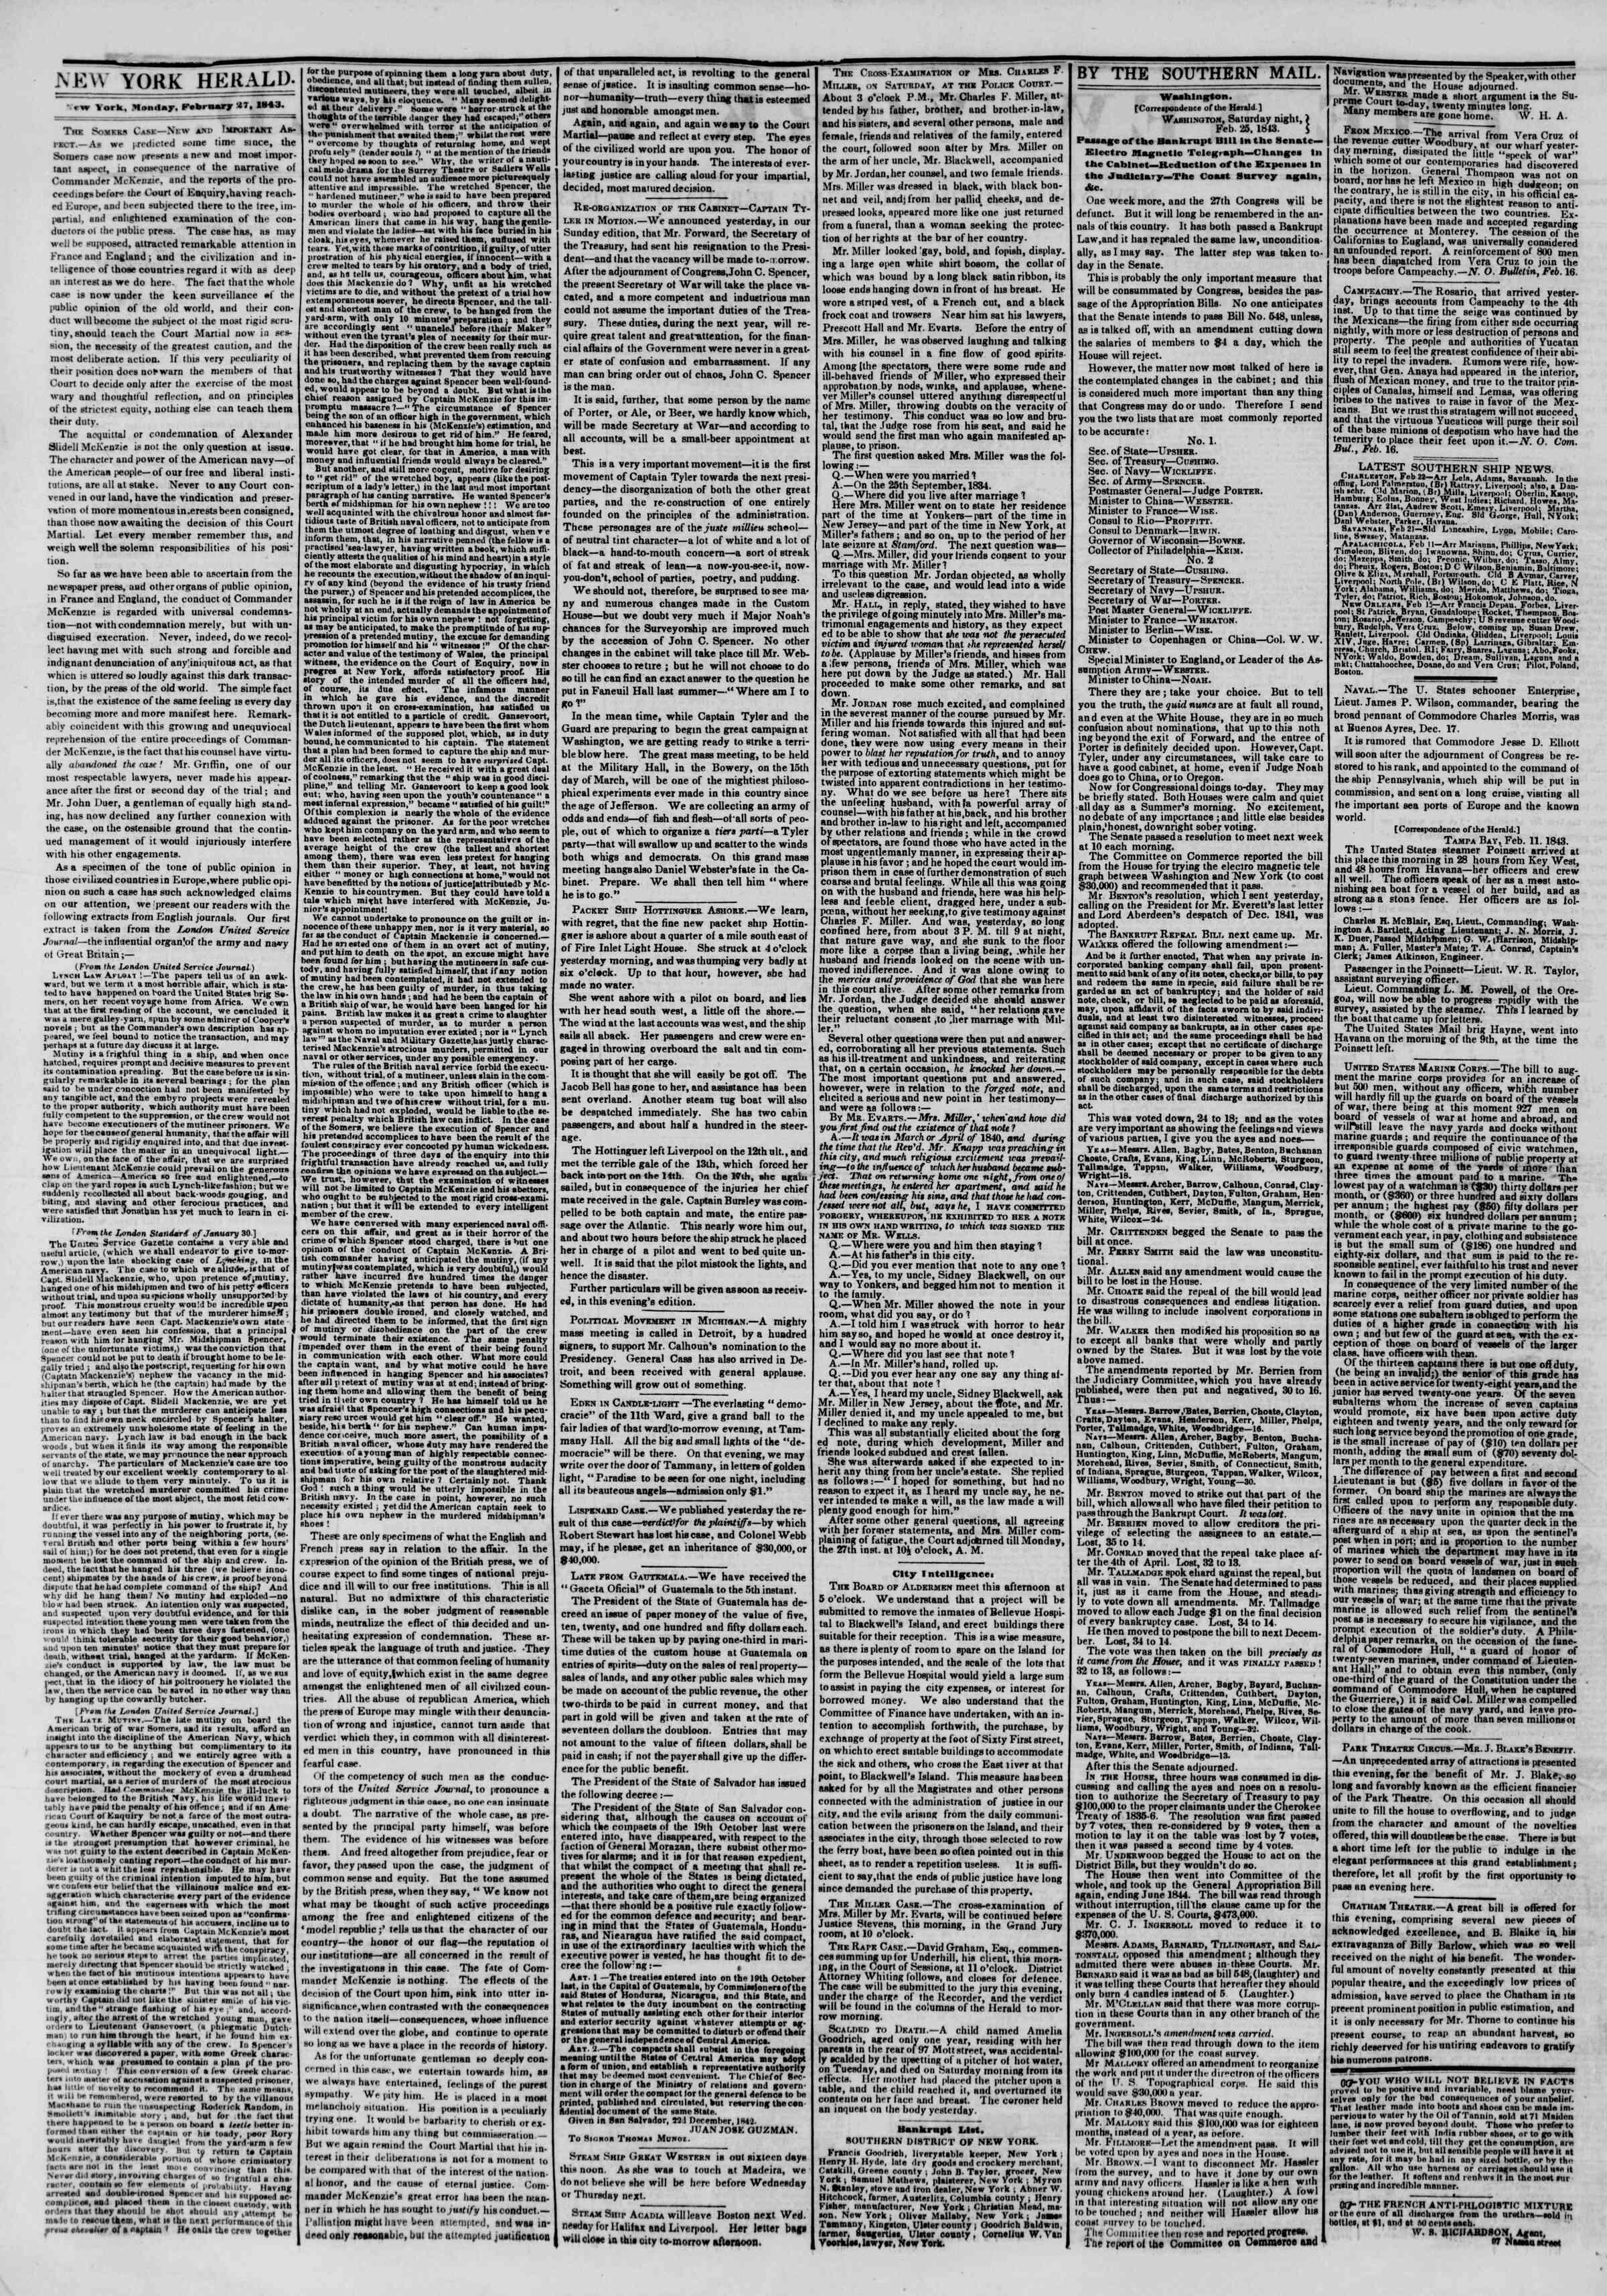 February 27, 1843 Tarihli The New York Herald Gazetesi Sayfa 2